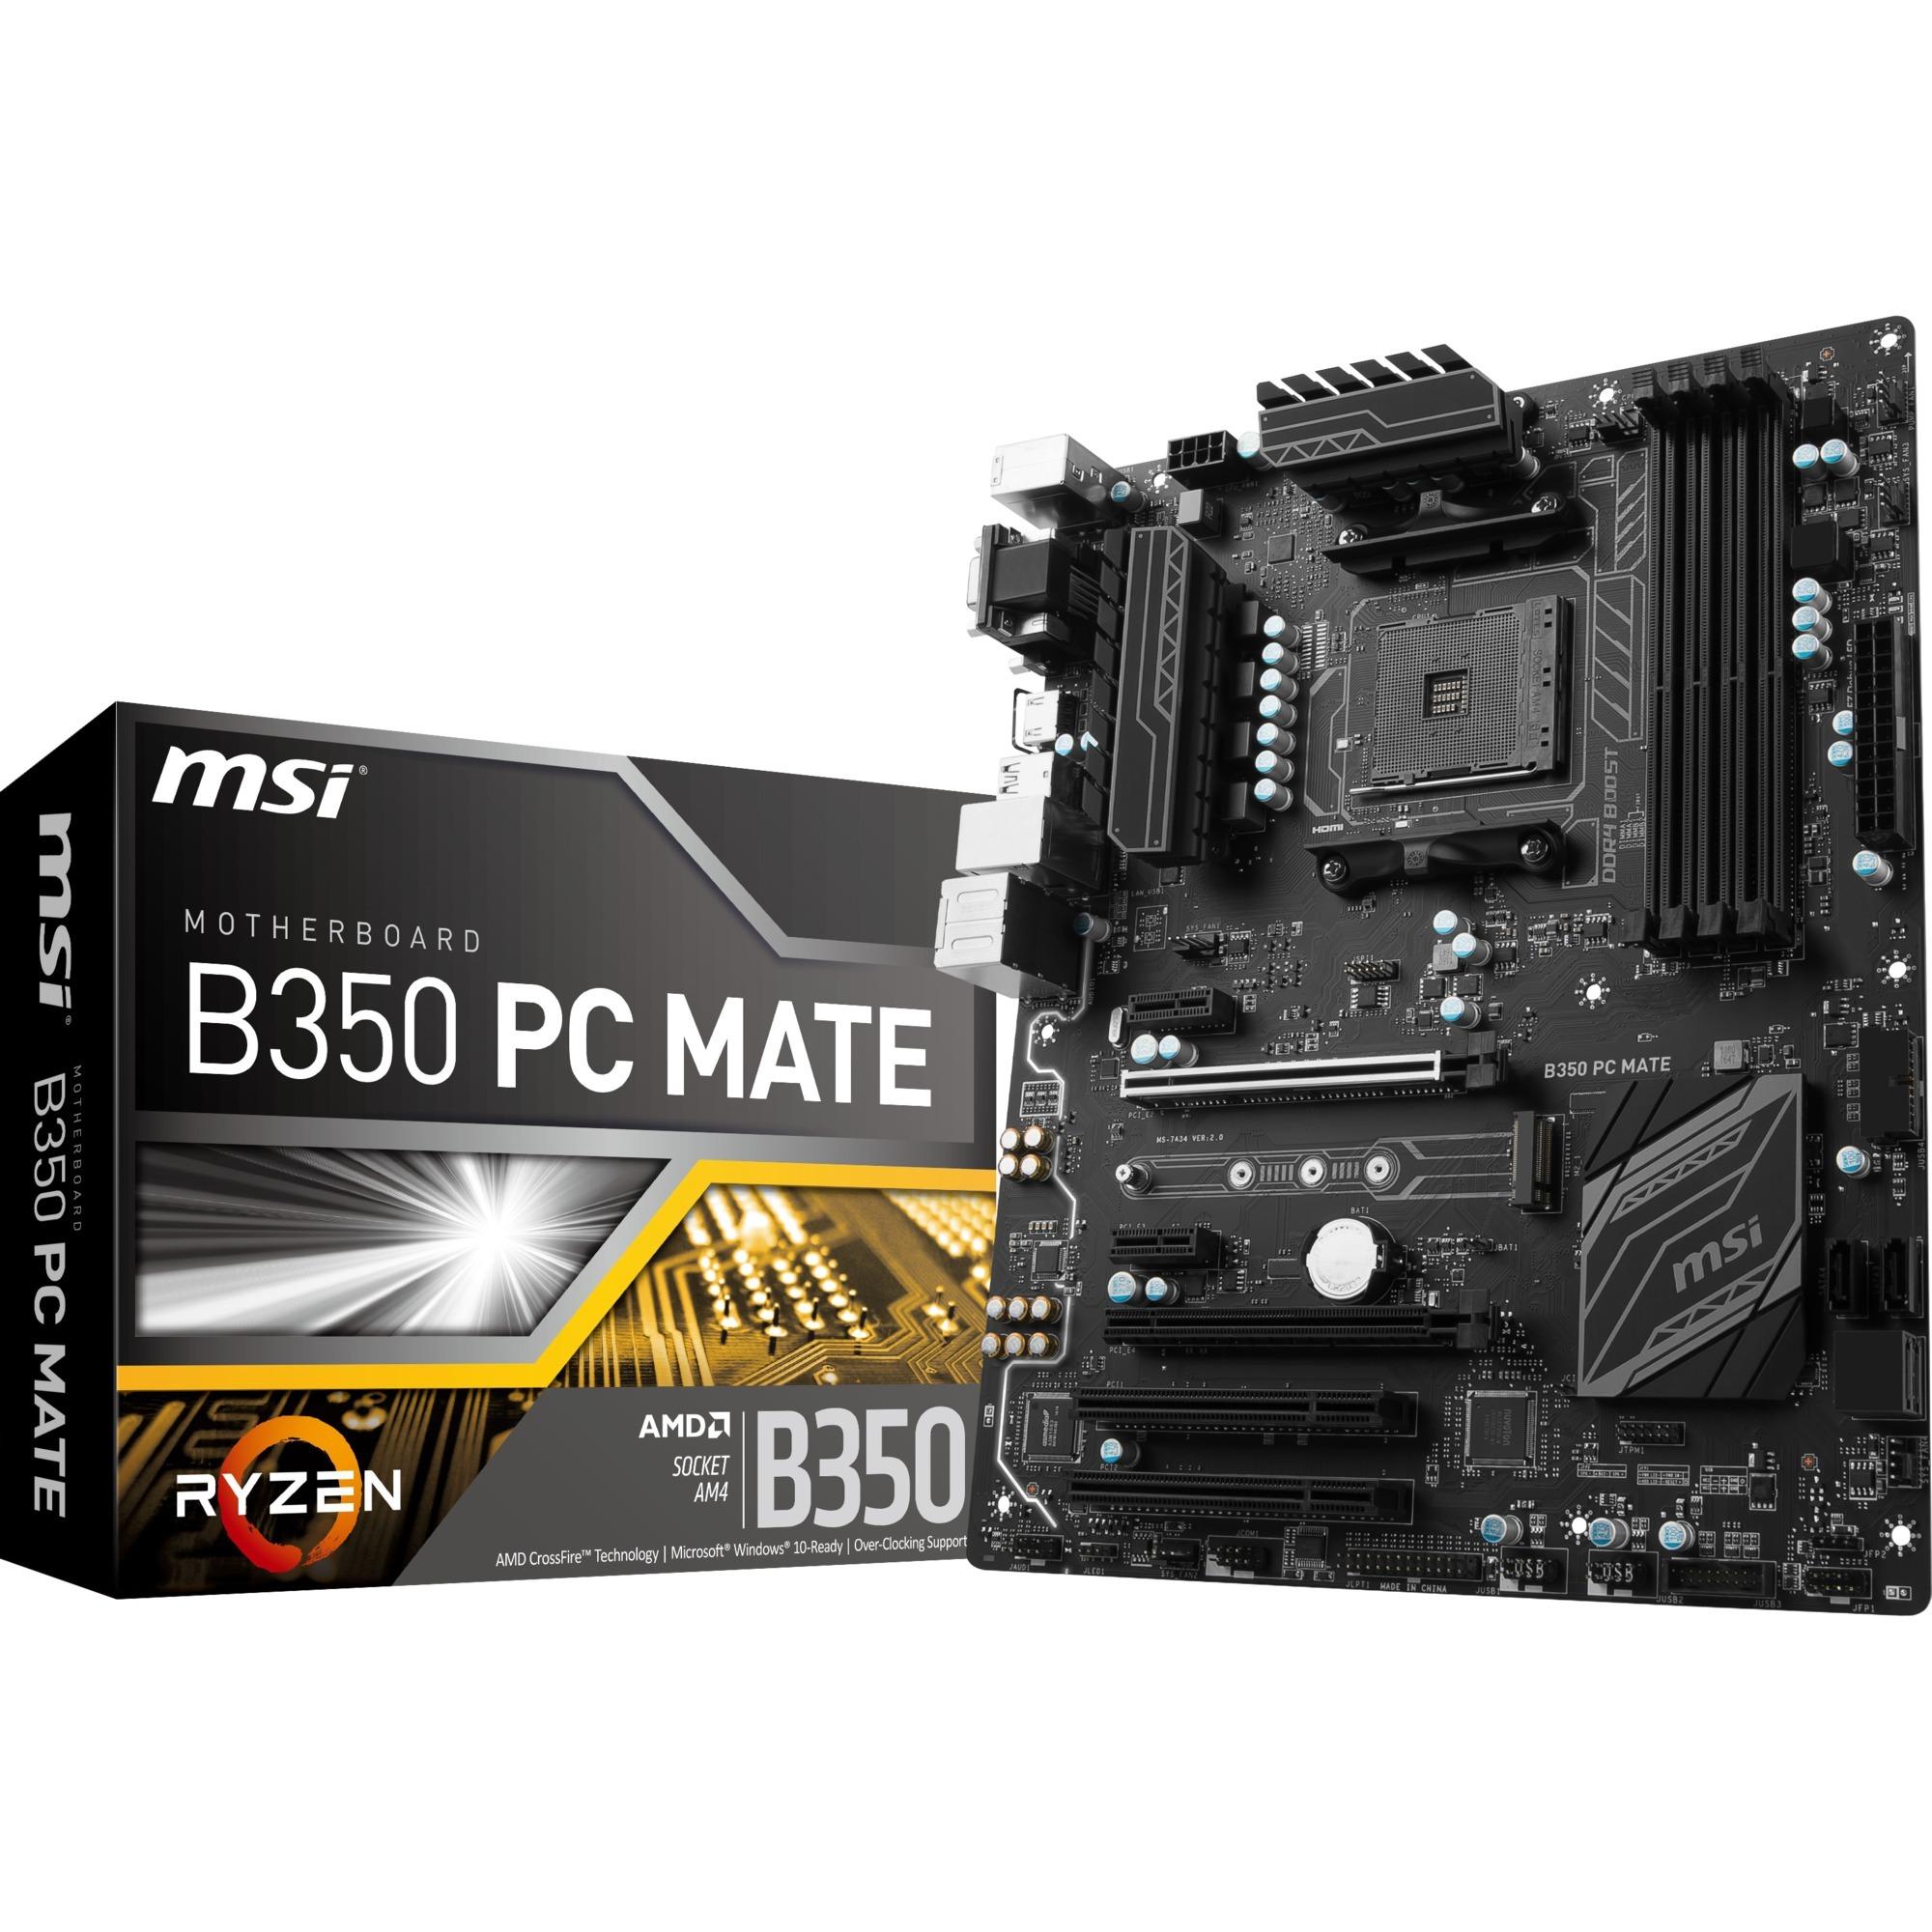 B350 PC MATE Zócalo AM4 AMD B350 ATX, Placa base